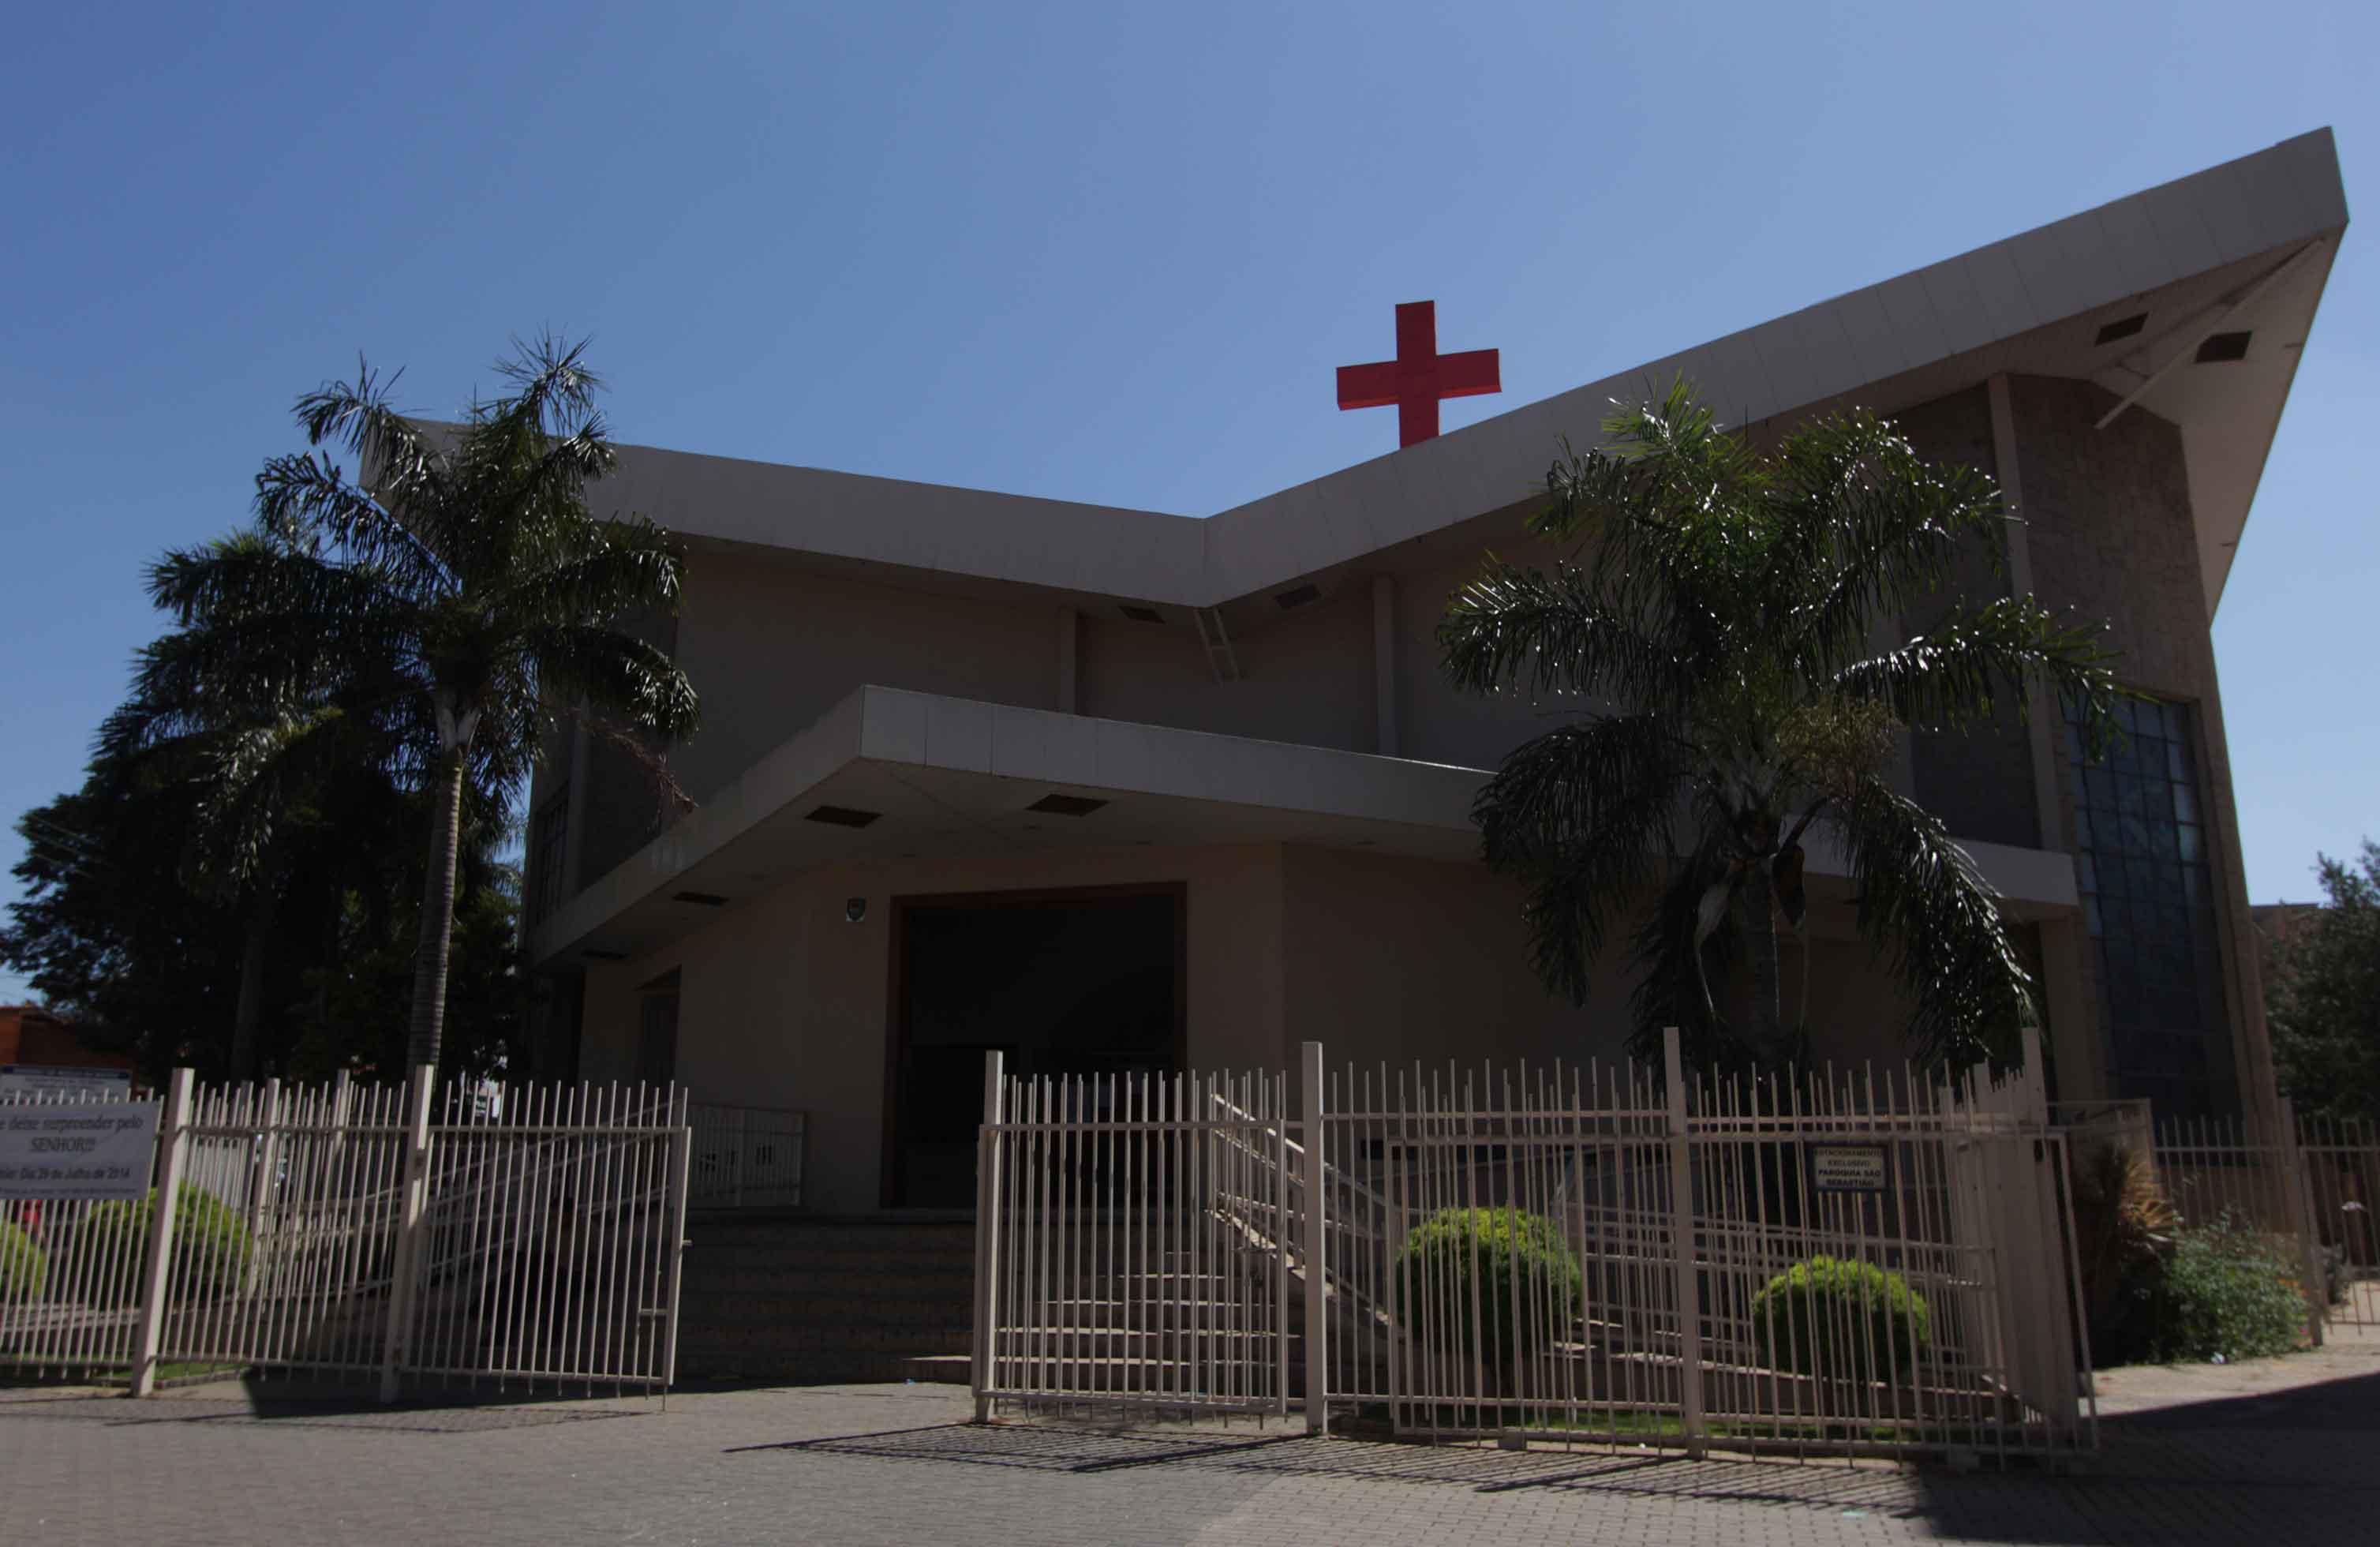 Itupeva-Turismo-Religioso-igreja-matriz-sao-sebastiao-bx